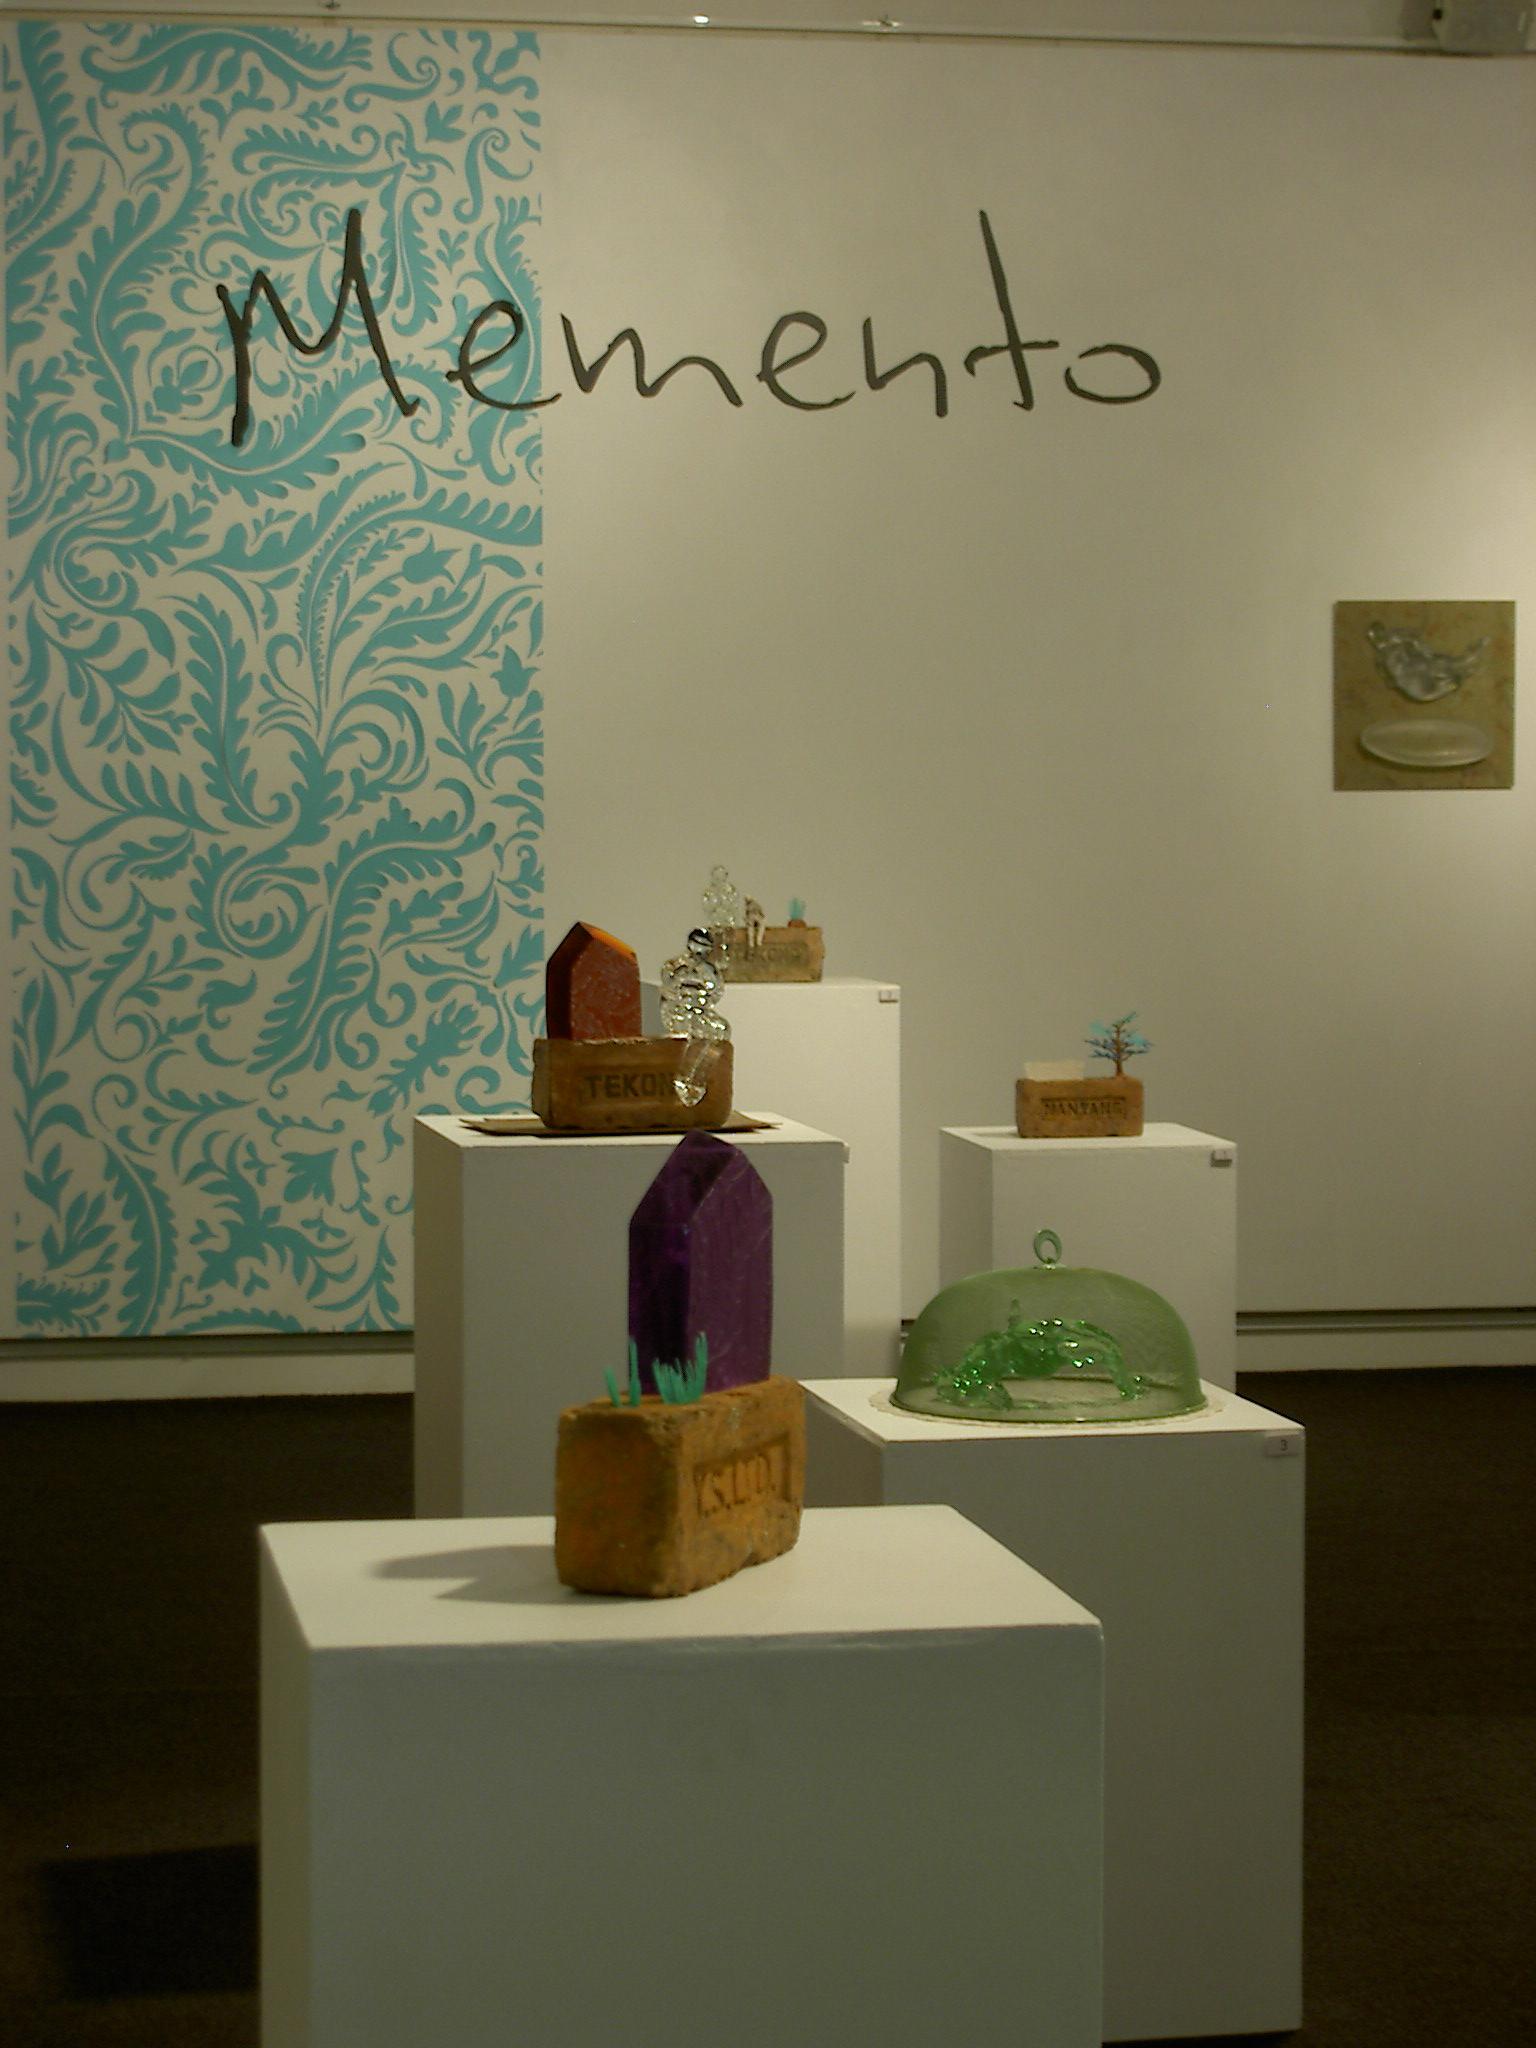 exhibition view.jpg